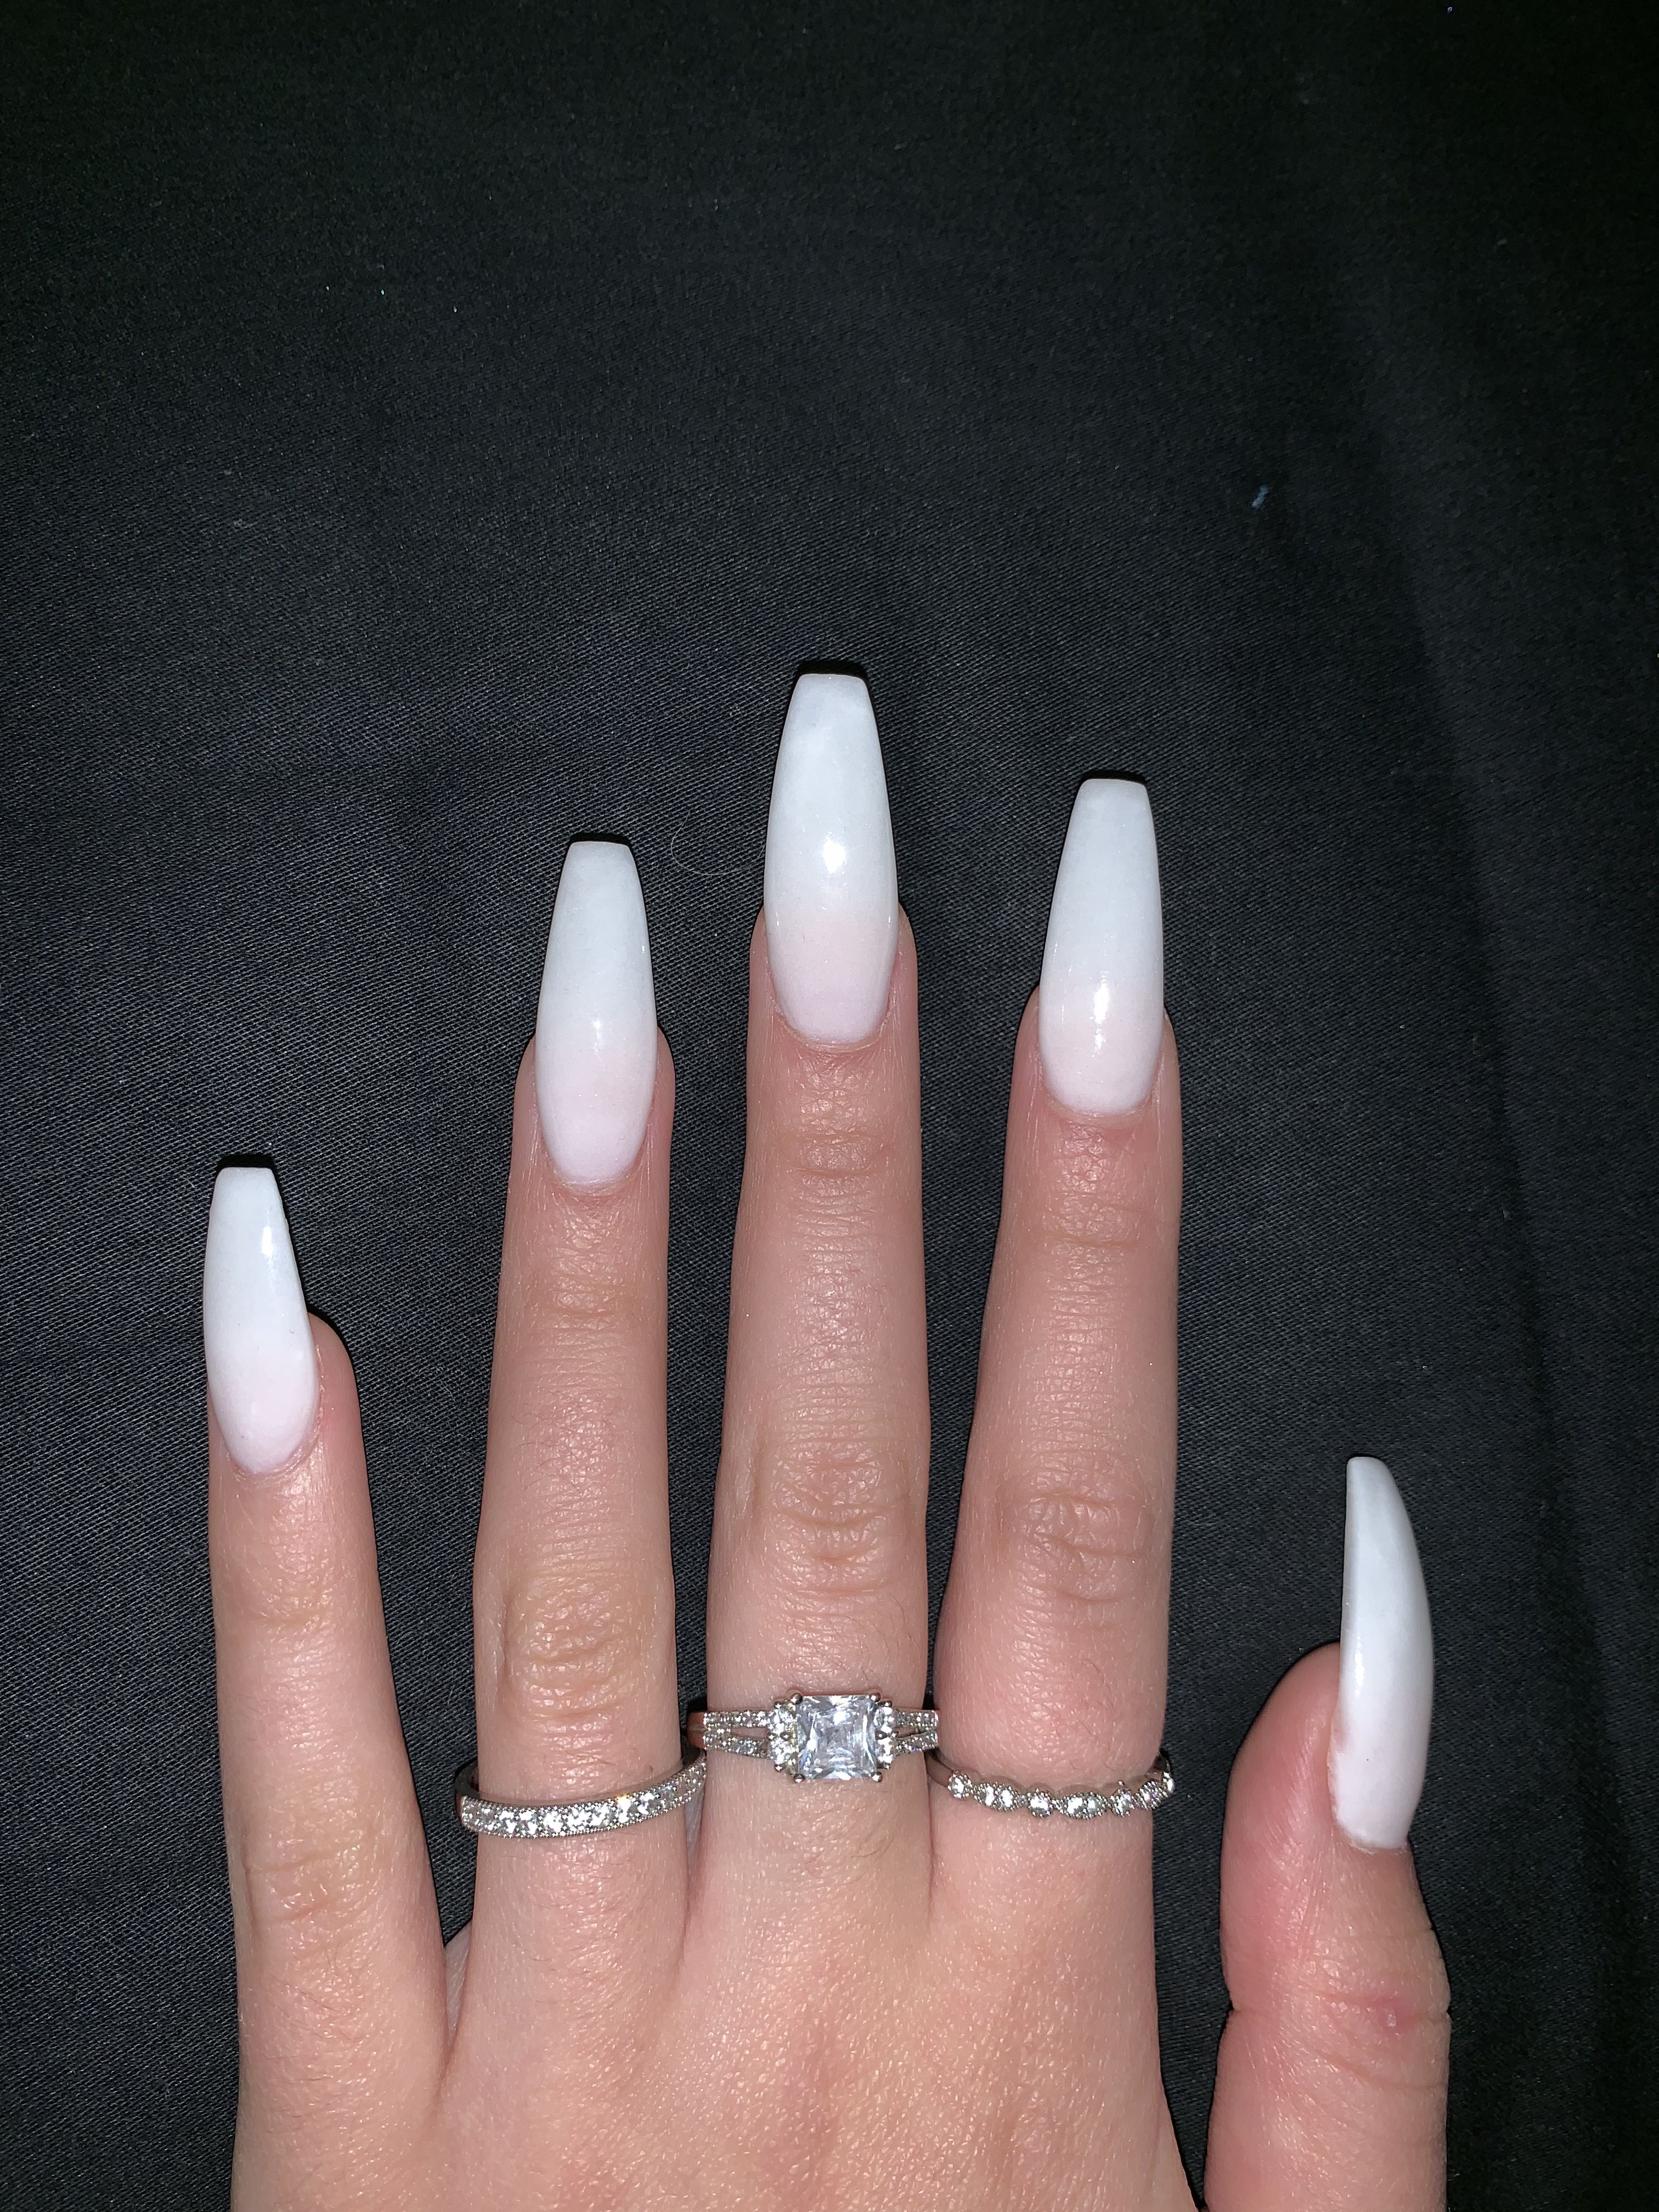 White Long Acrylic Nails Plain Acrylic Nails Coffin Nails Designs Long Acrylic Nails